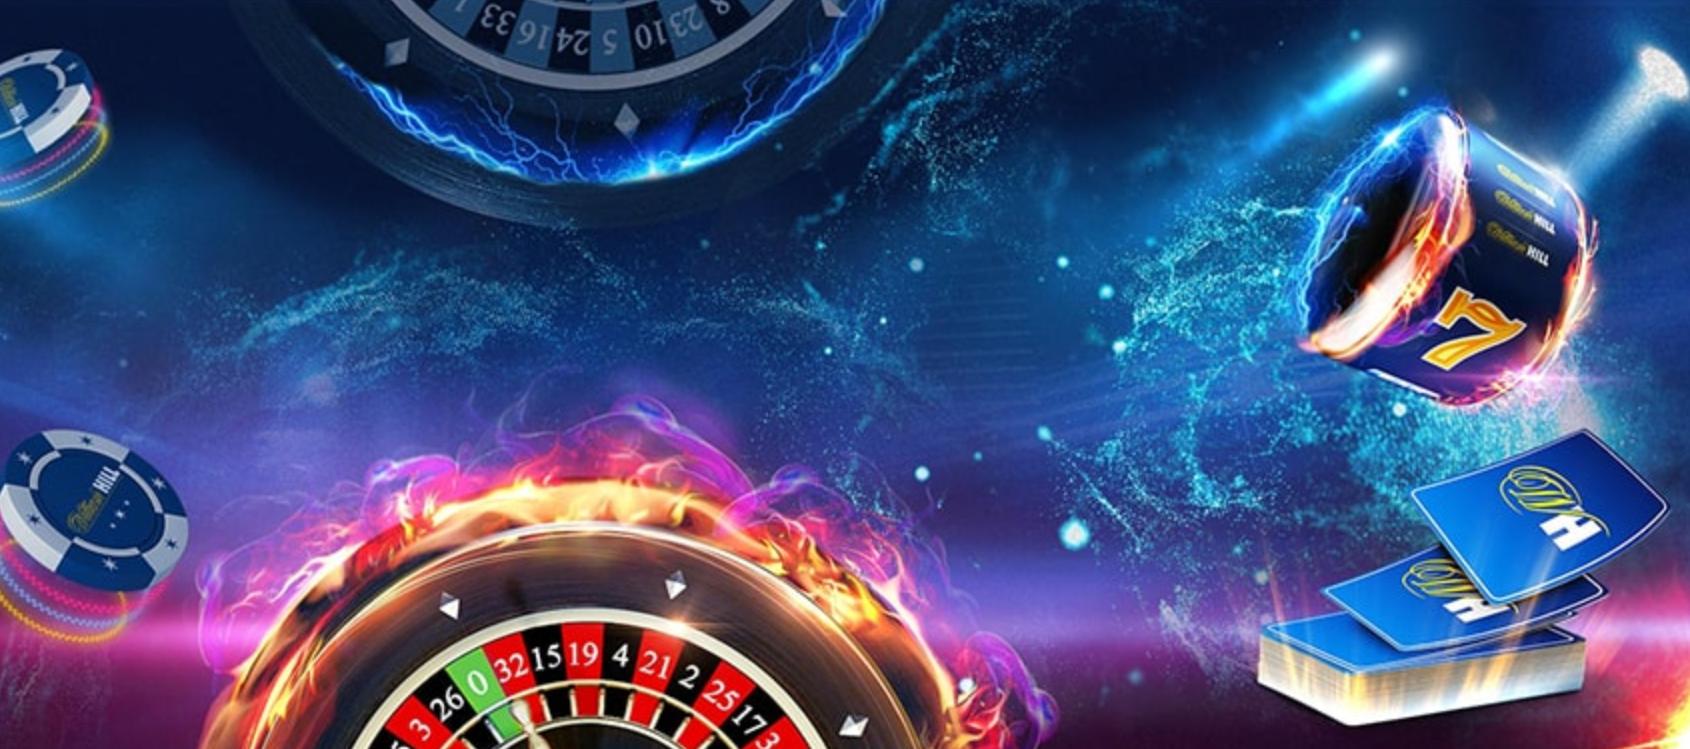 Casino bonus gør spillet lidt sjovere